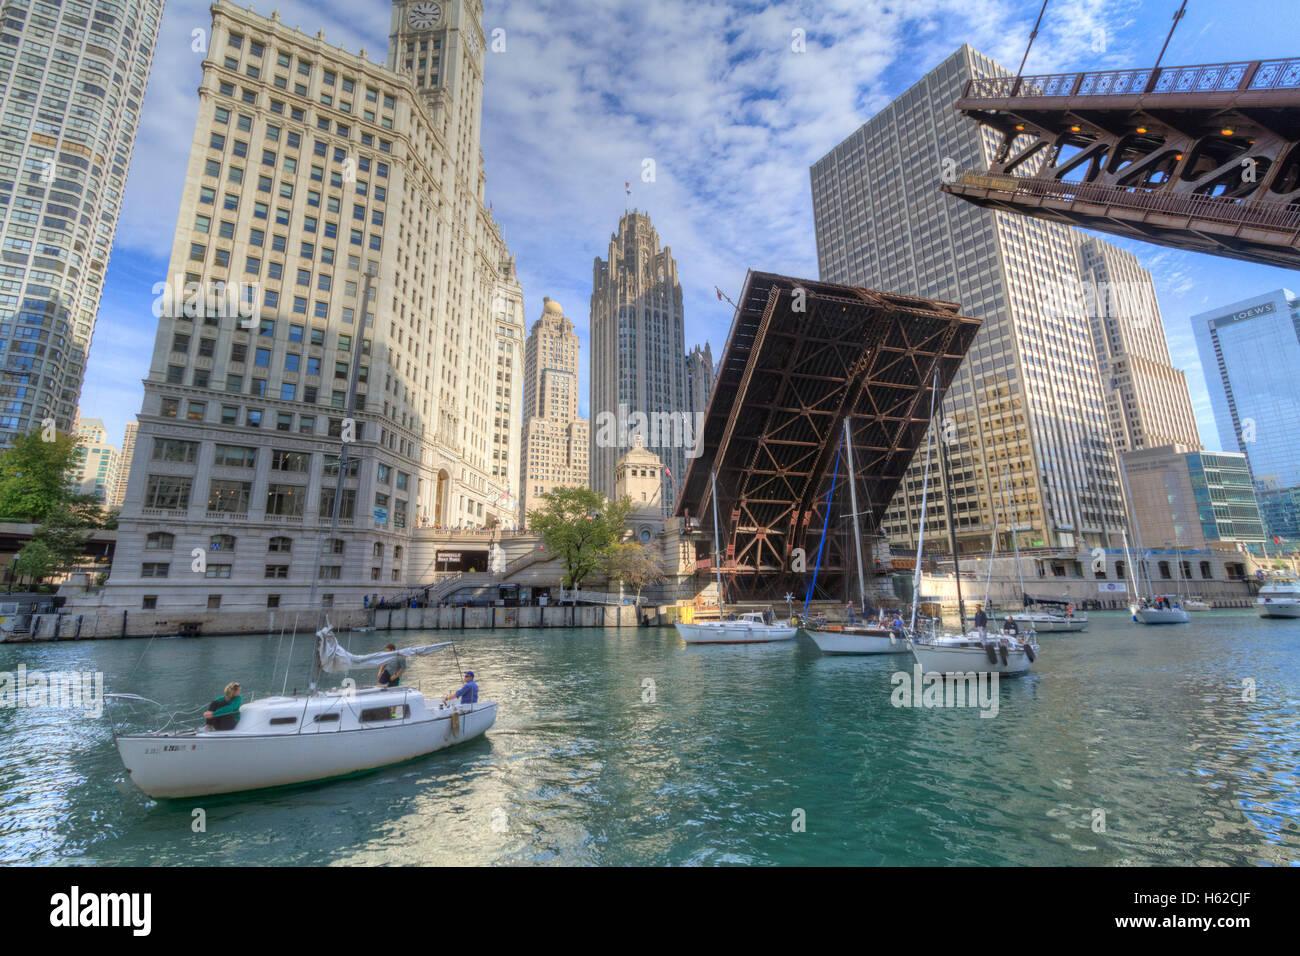 Raising the Du Sable Bridge, Chicago, Illinois - Stock Image